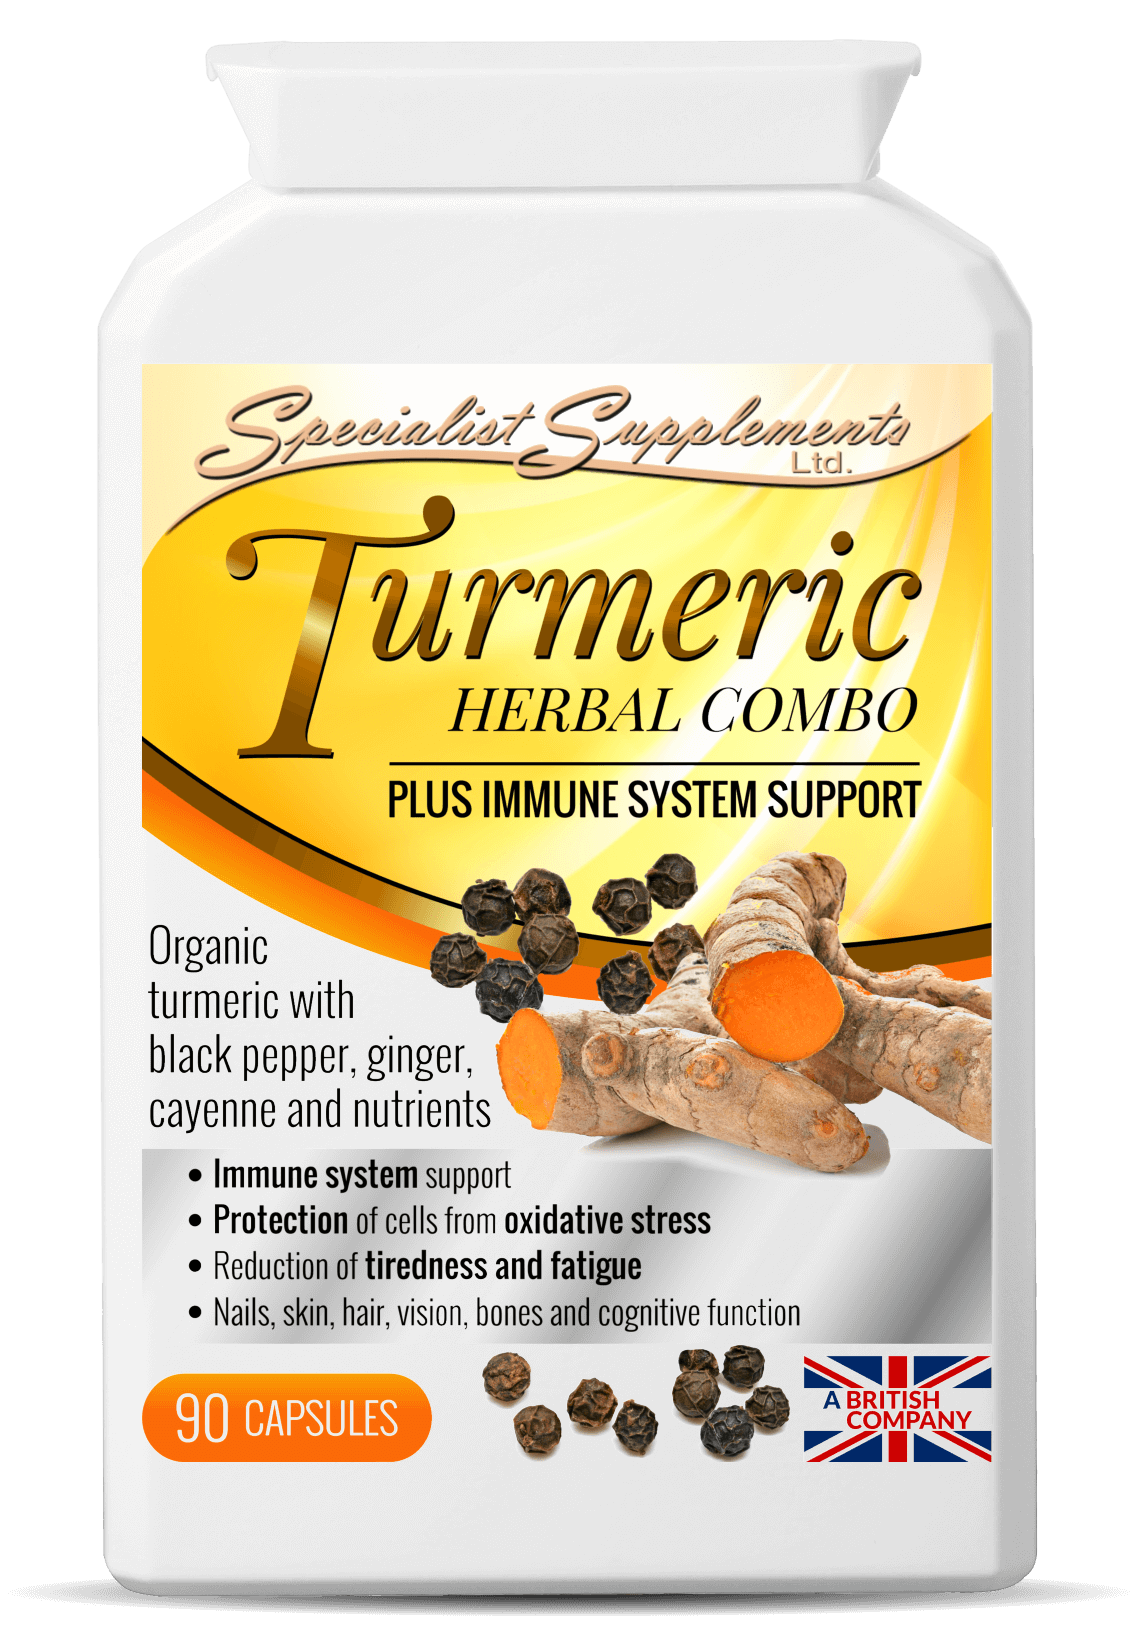 Turmeric Herbal Combo 90's